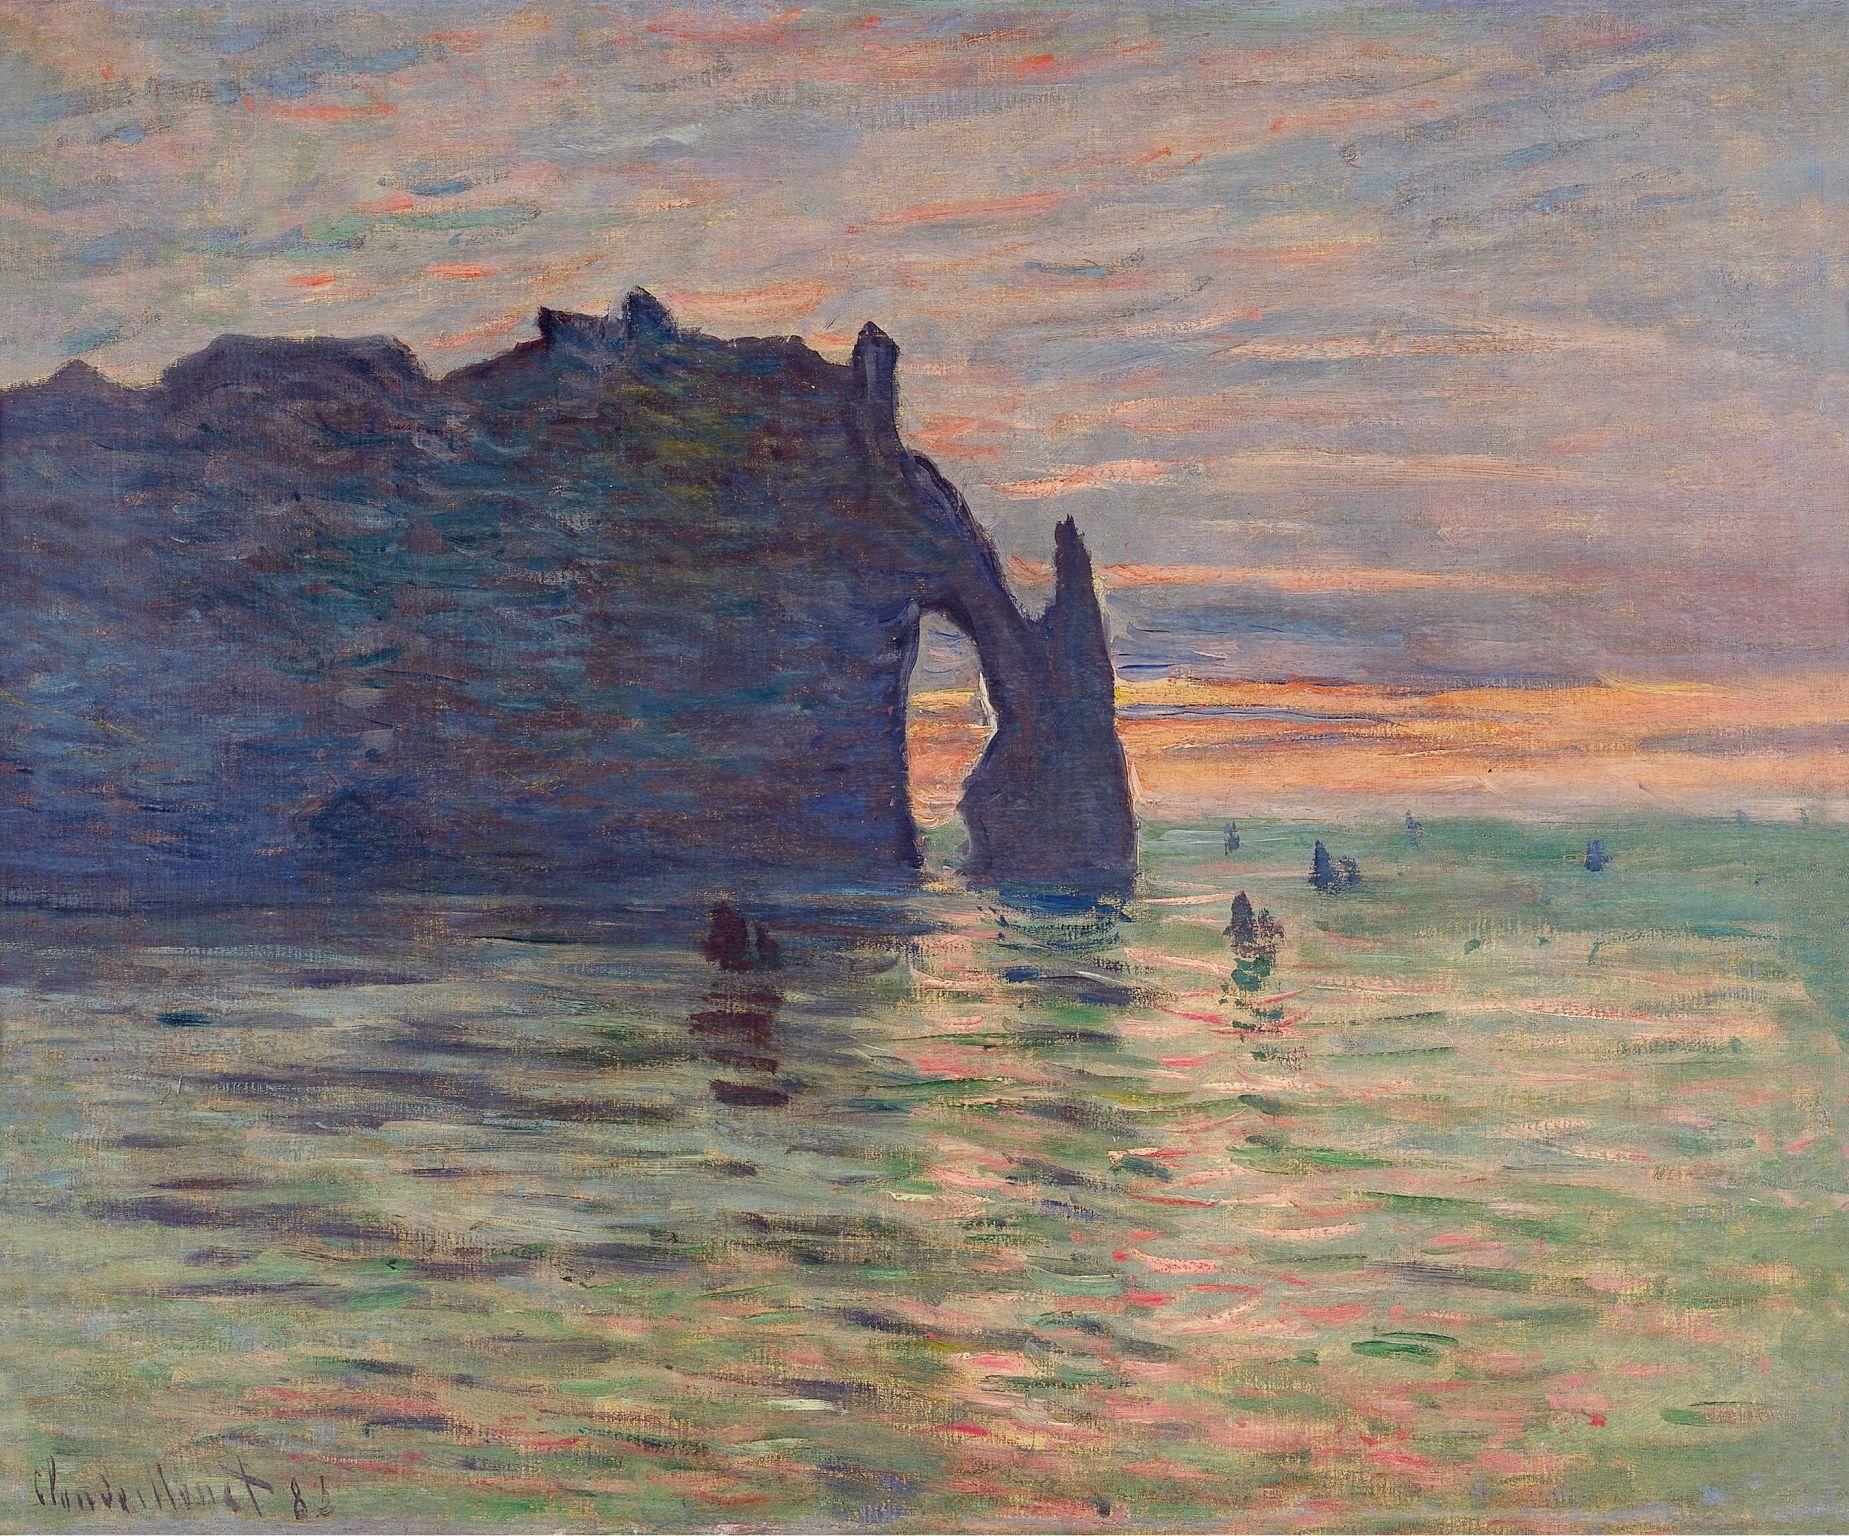 Tote Bag - Sainte Adresse Monet by VIDA VIDA DAgluYKXm